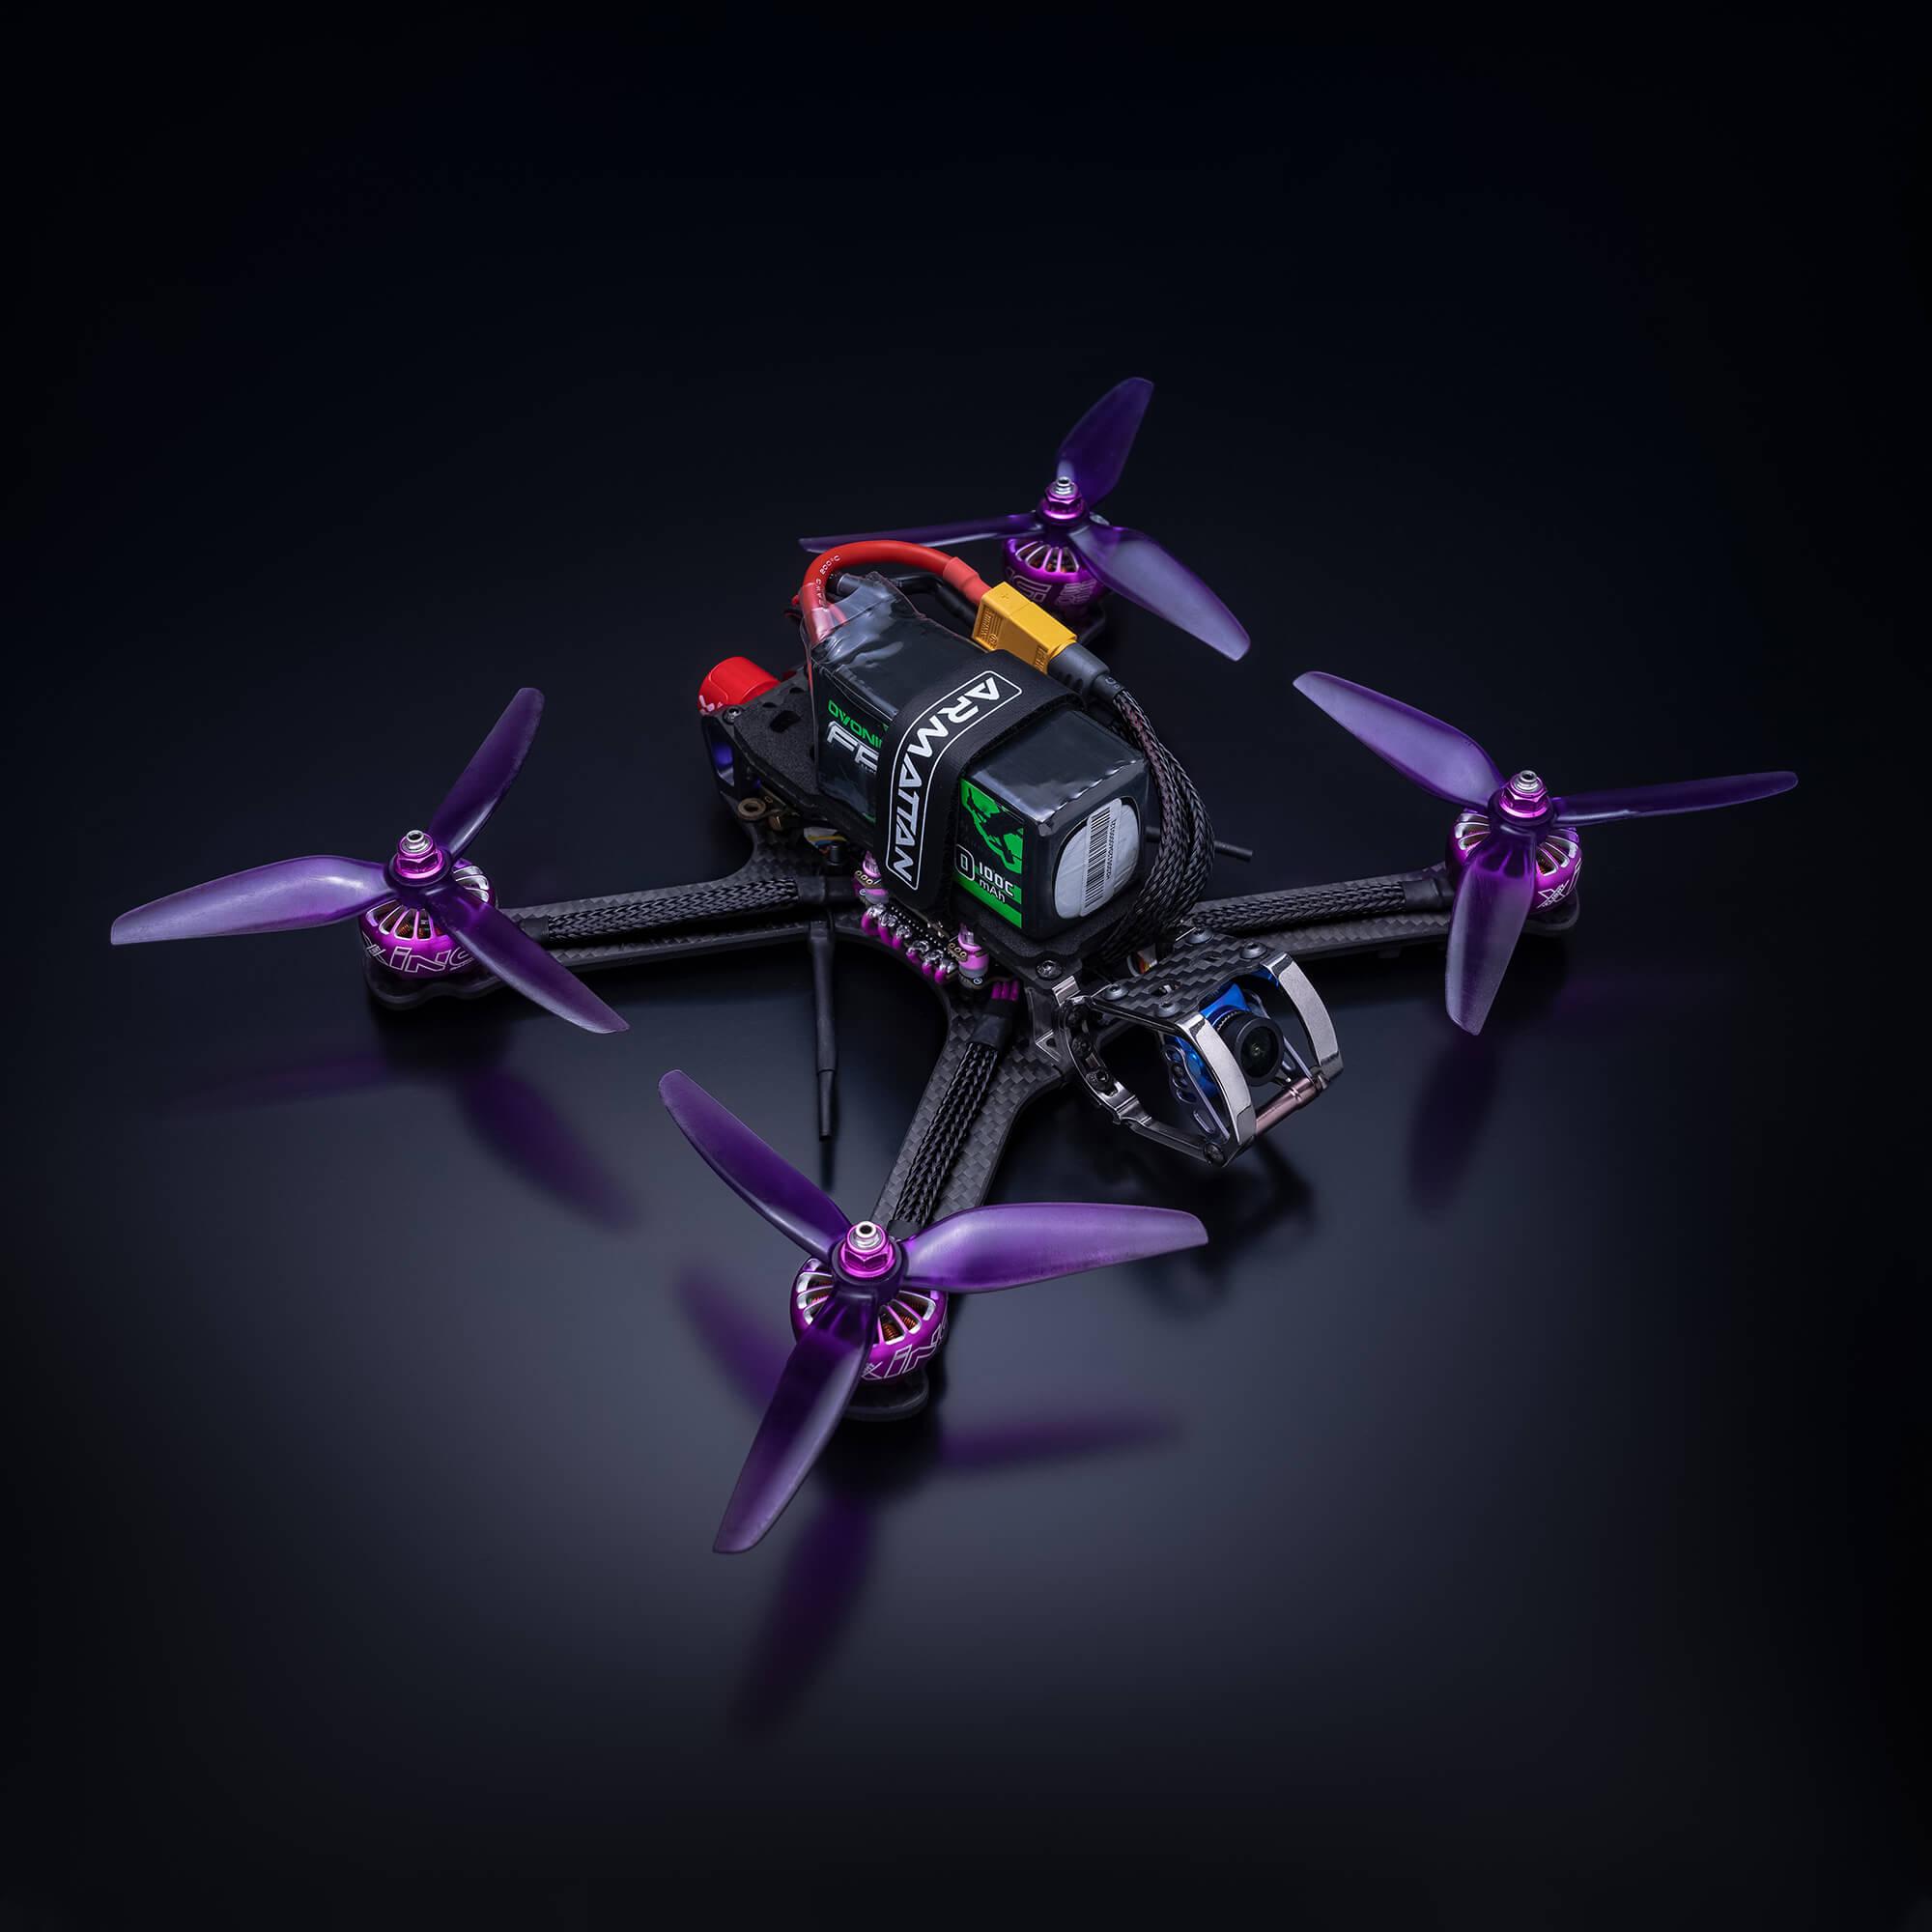 Drone-copy-1